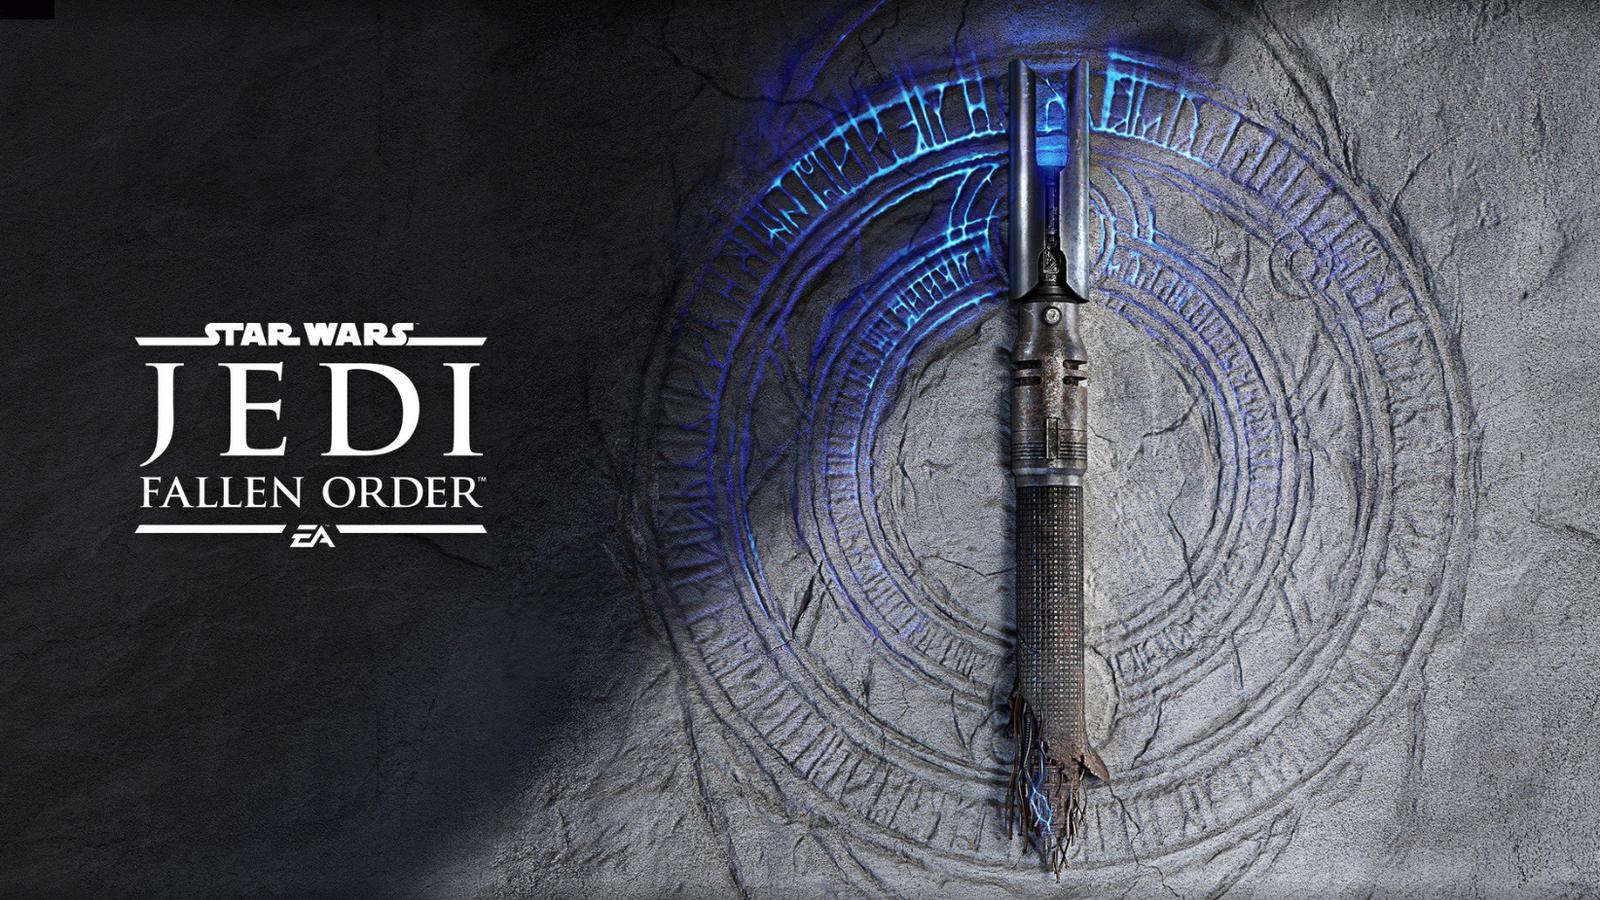 Amazon leaks Star Wars Jedi: Fallen Order merch, confirms that